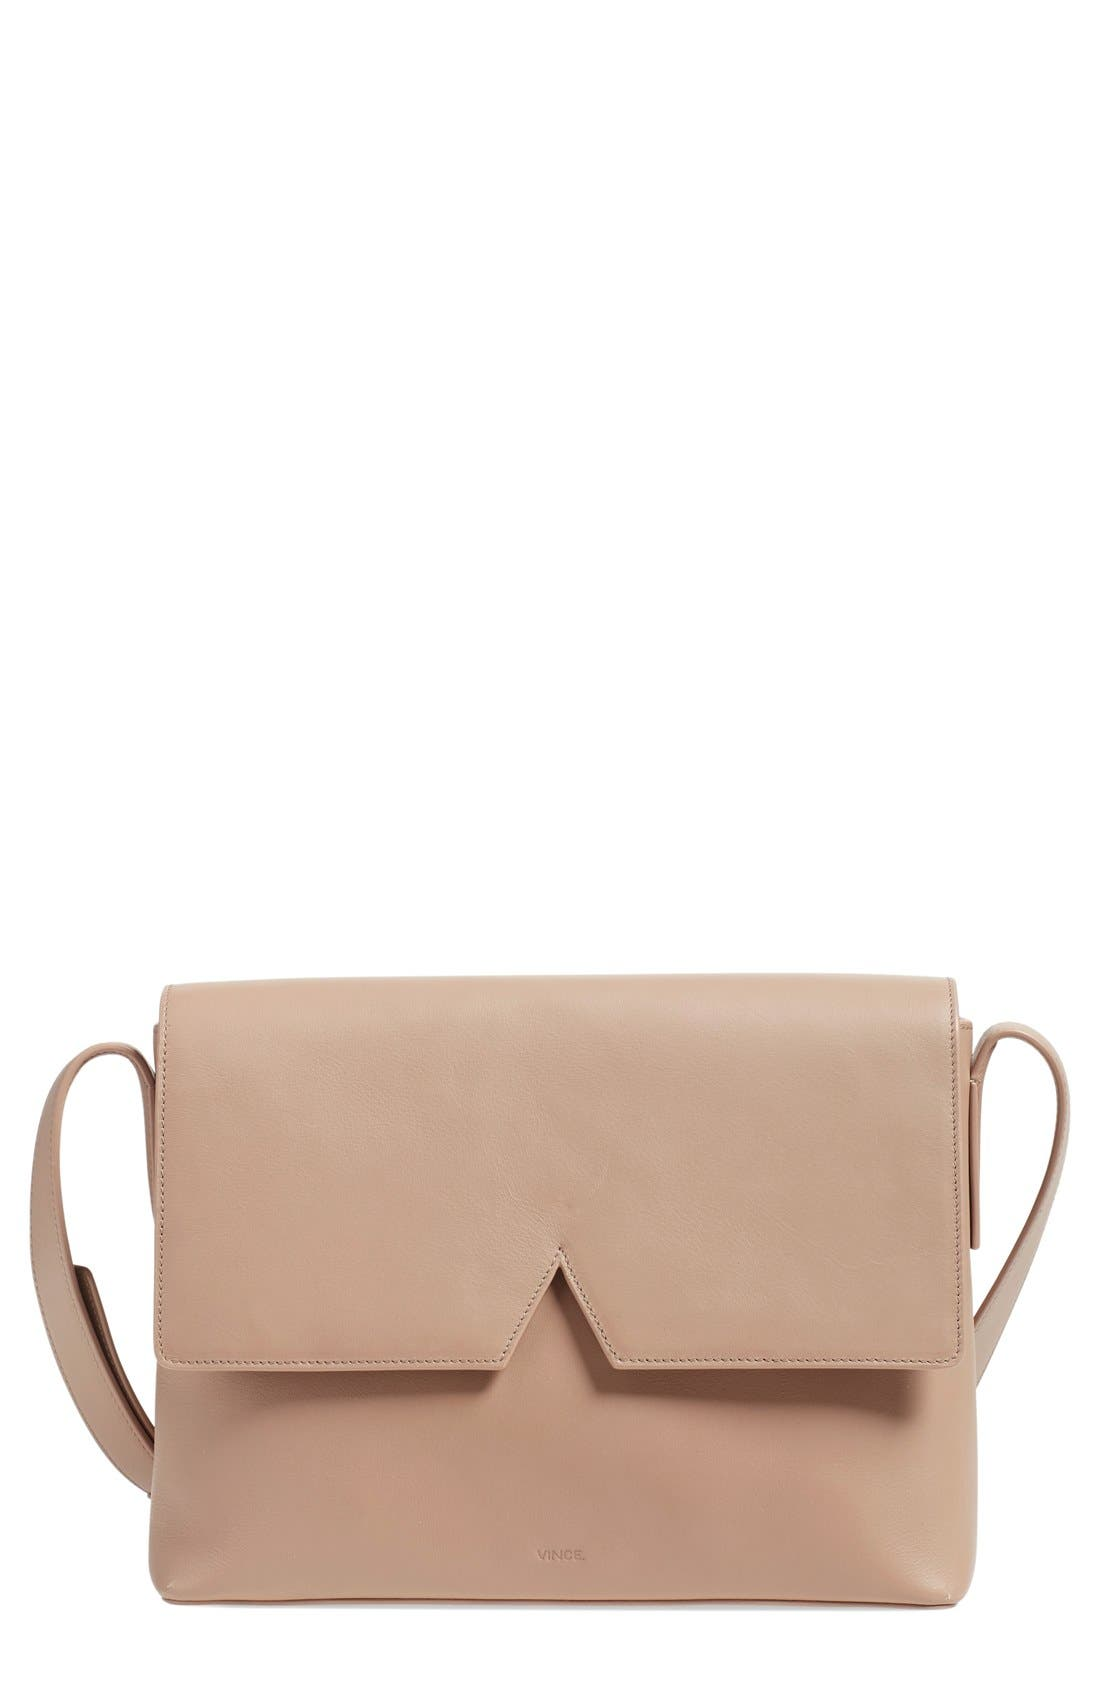 Alternate Image 1 Selected - Vince 'Medium Signature' Leather Crossbody Bag